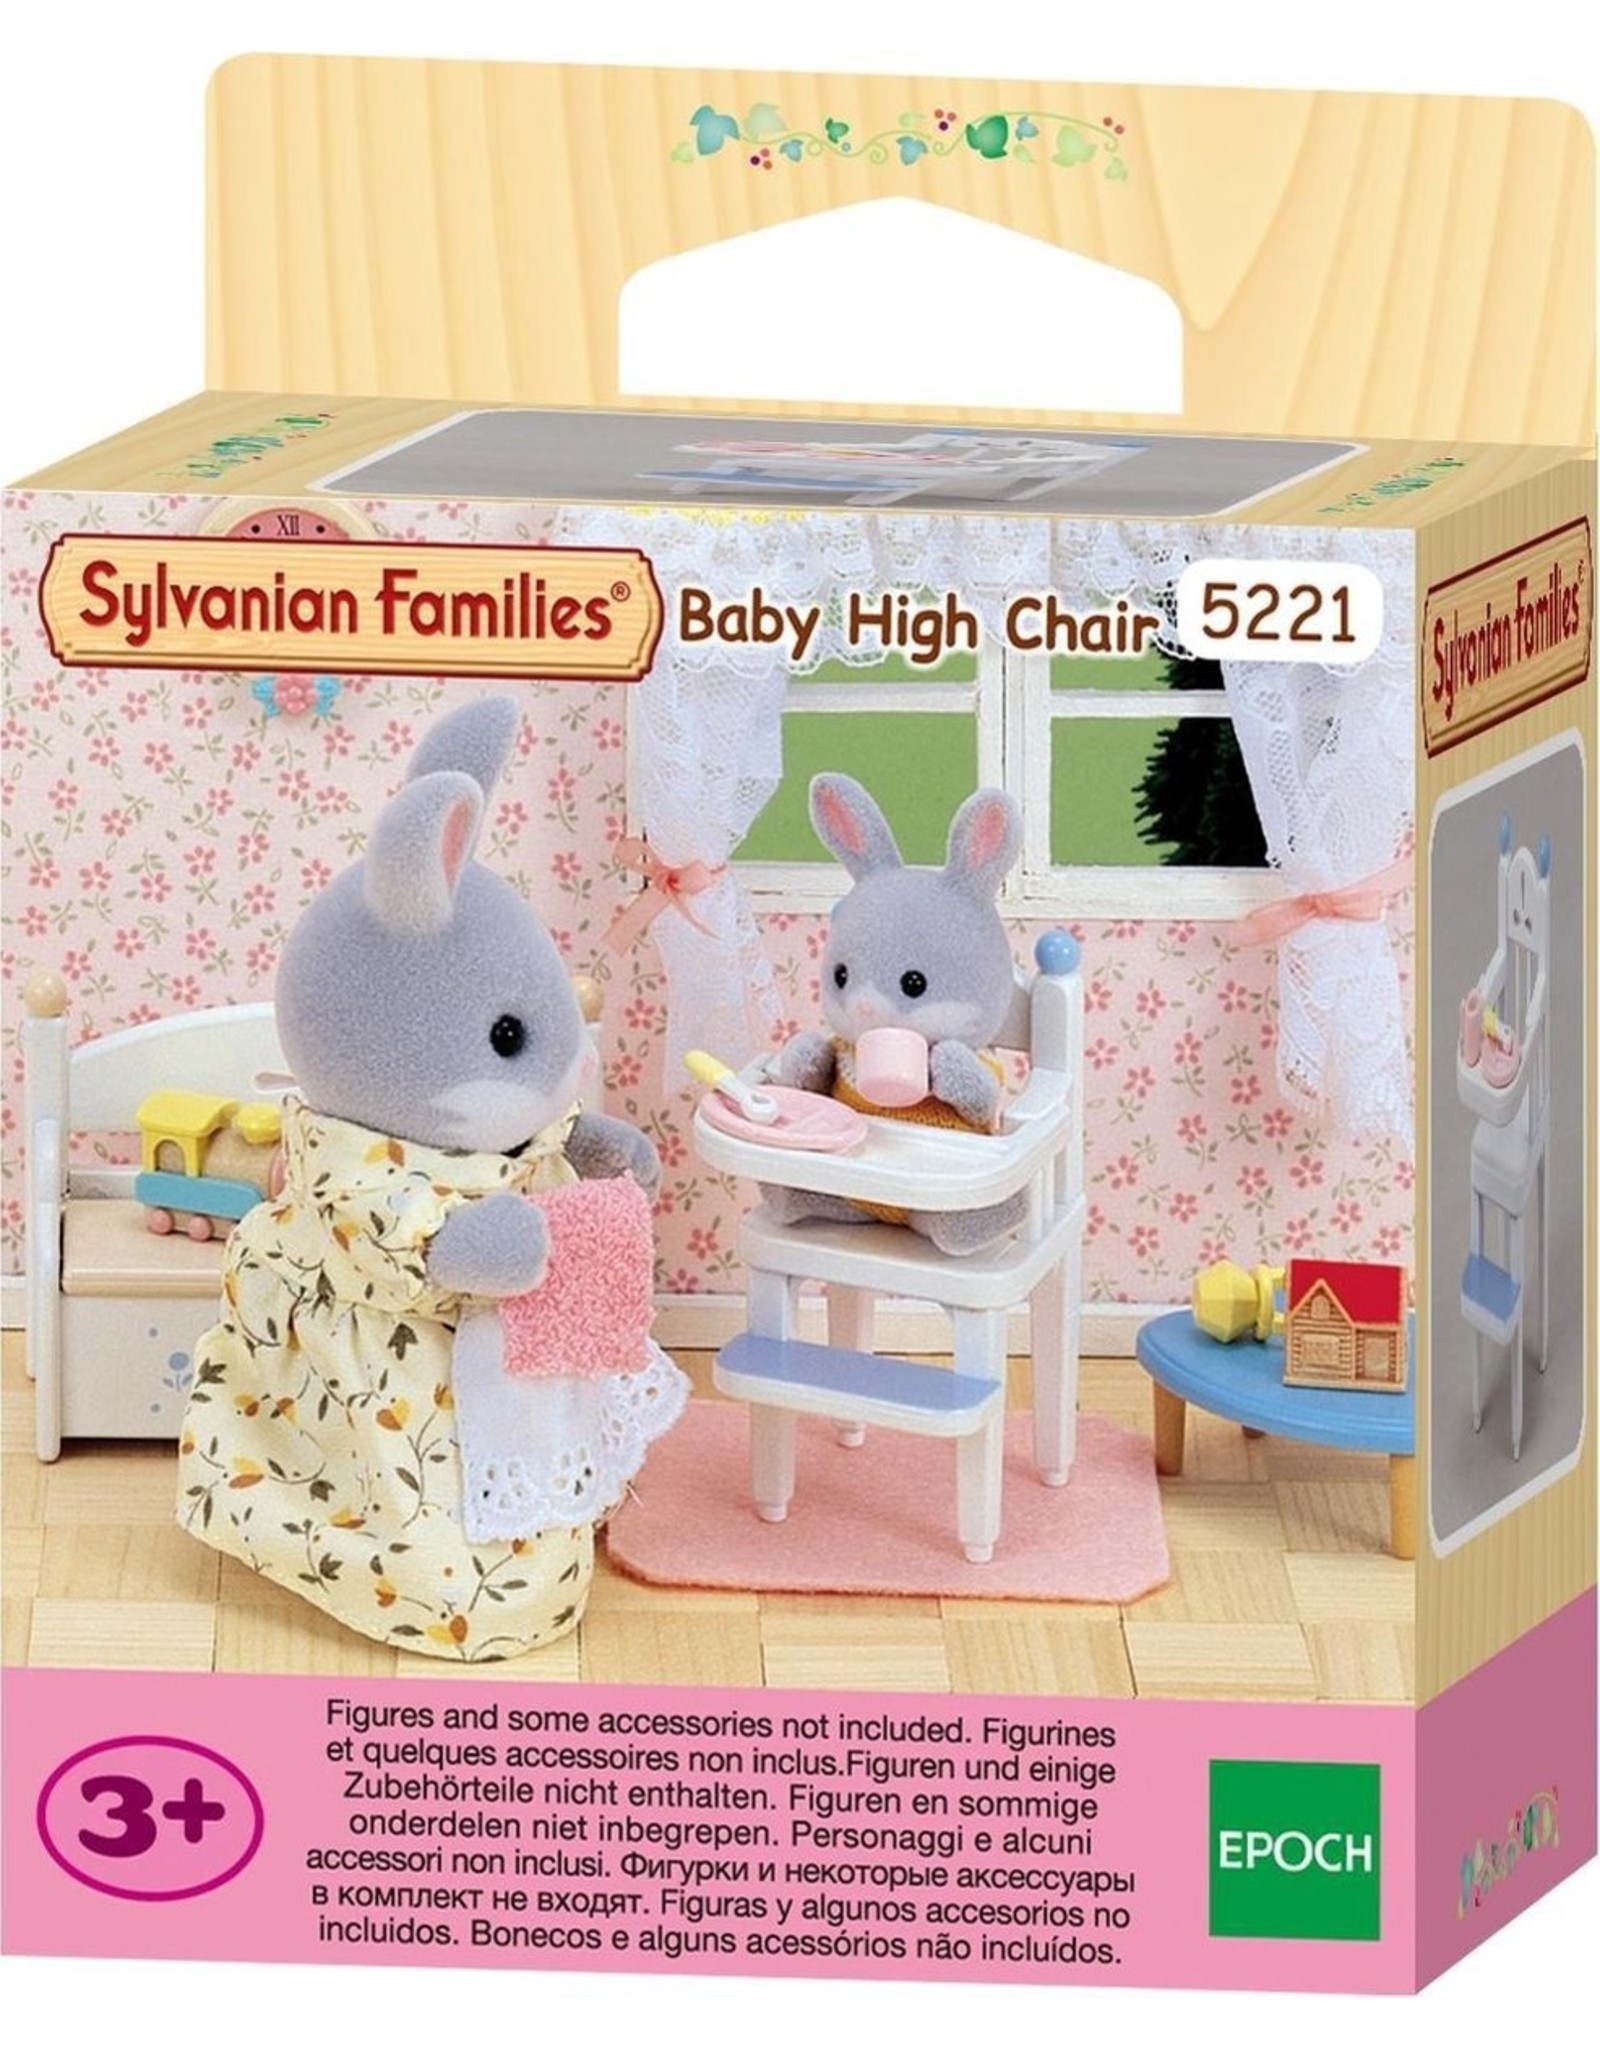 Sylvanian Families Sylvanian Families Hoge Kinderstoel